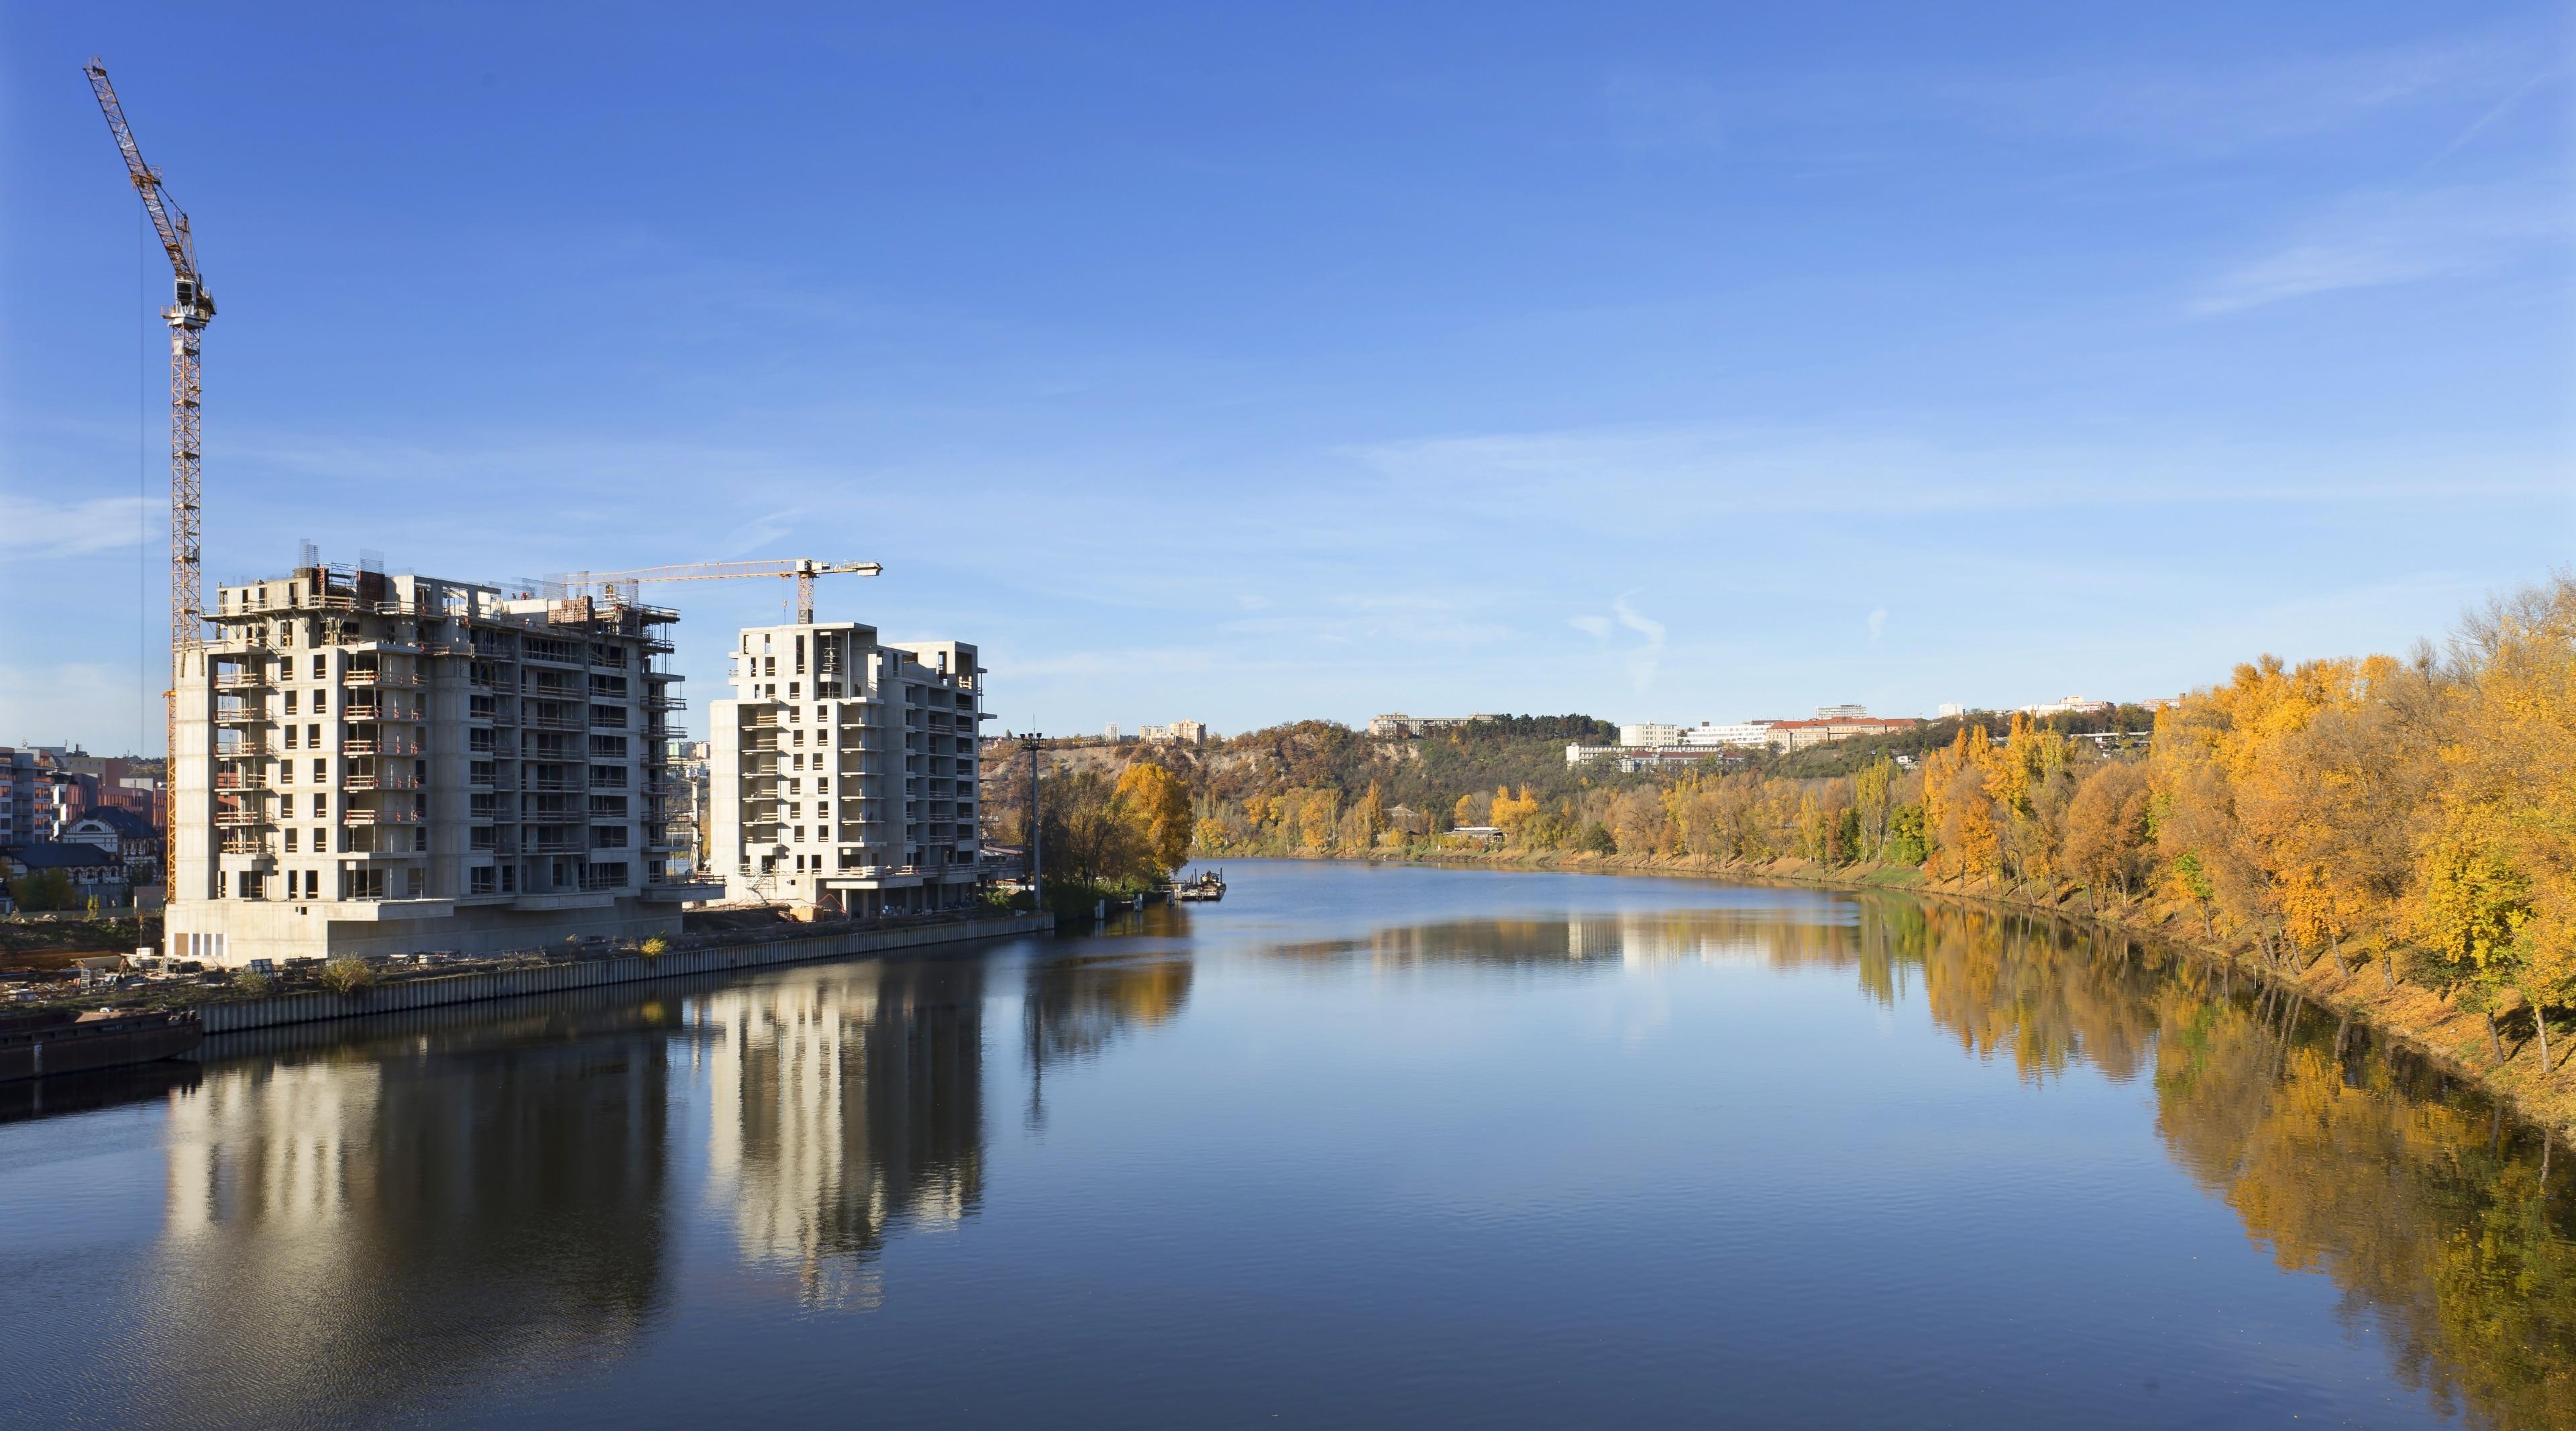 Holesovice, Prague, Czech Republic